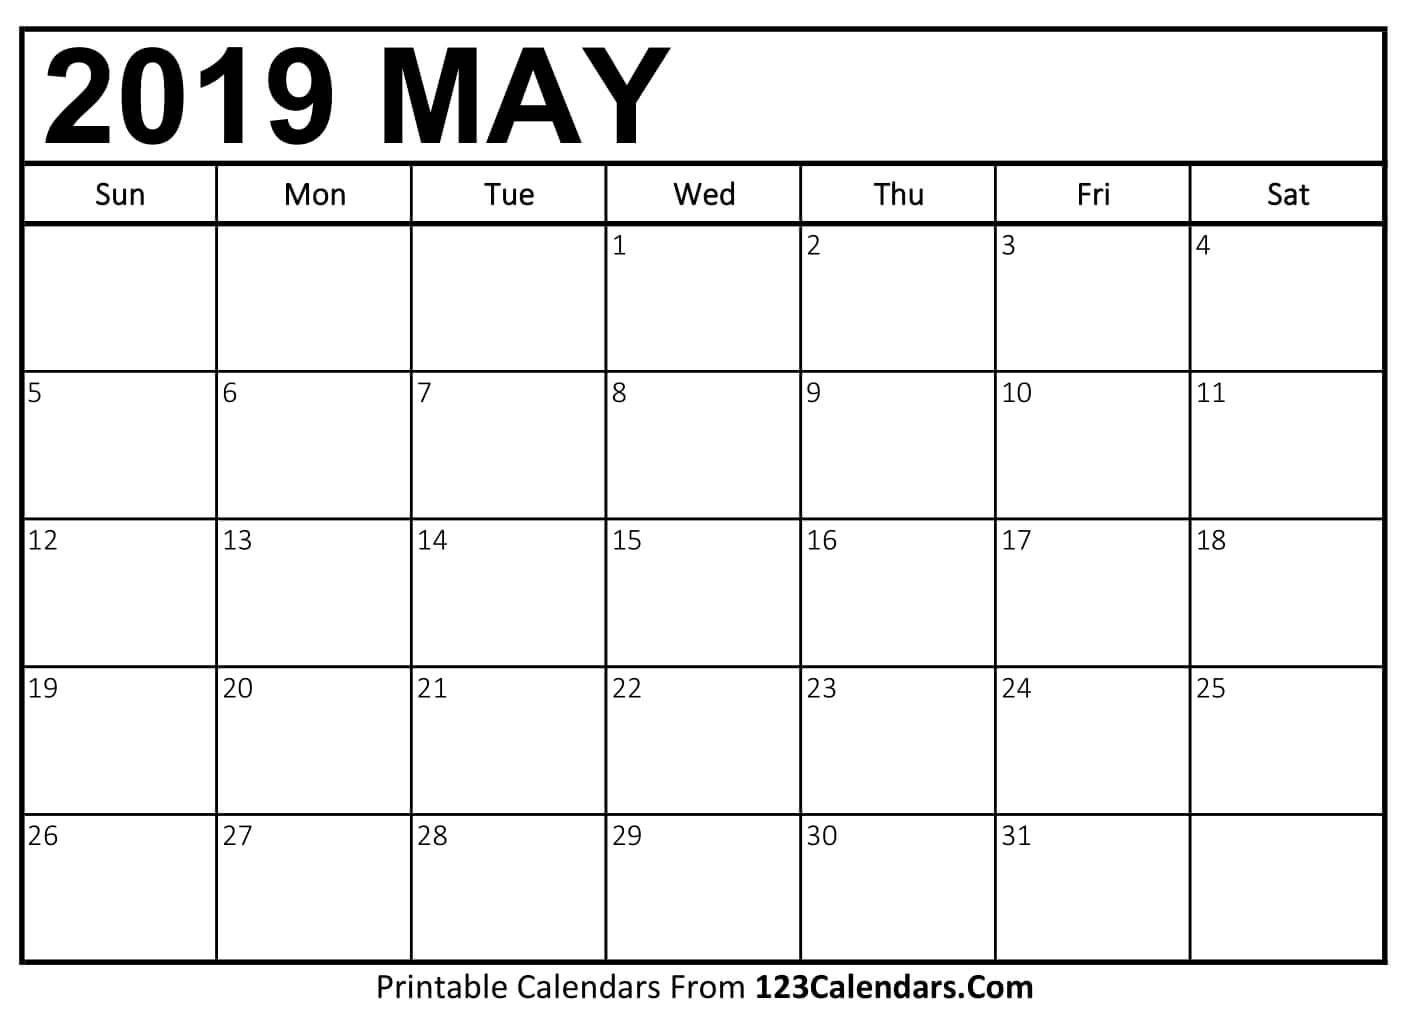 Printable May 2019 Calendar Templates – 123Calendars Calendar 2019 May